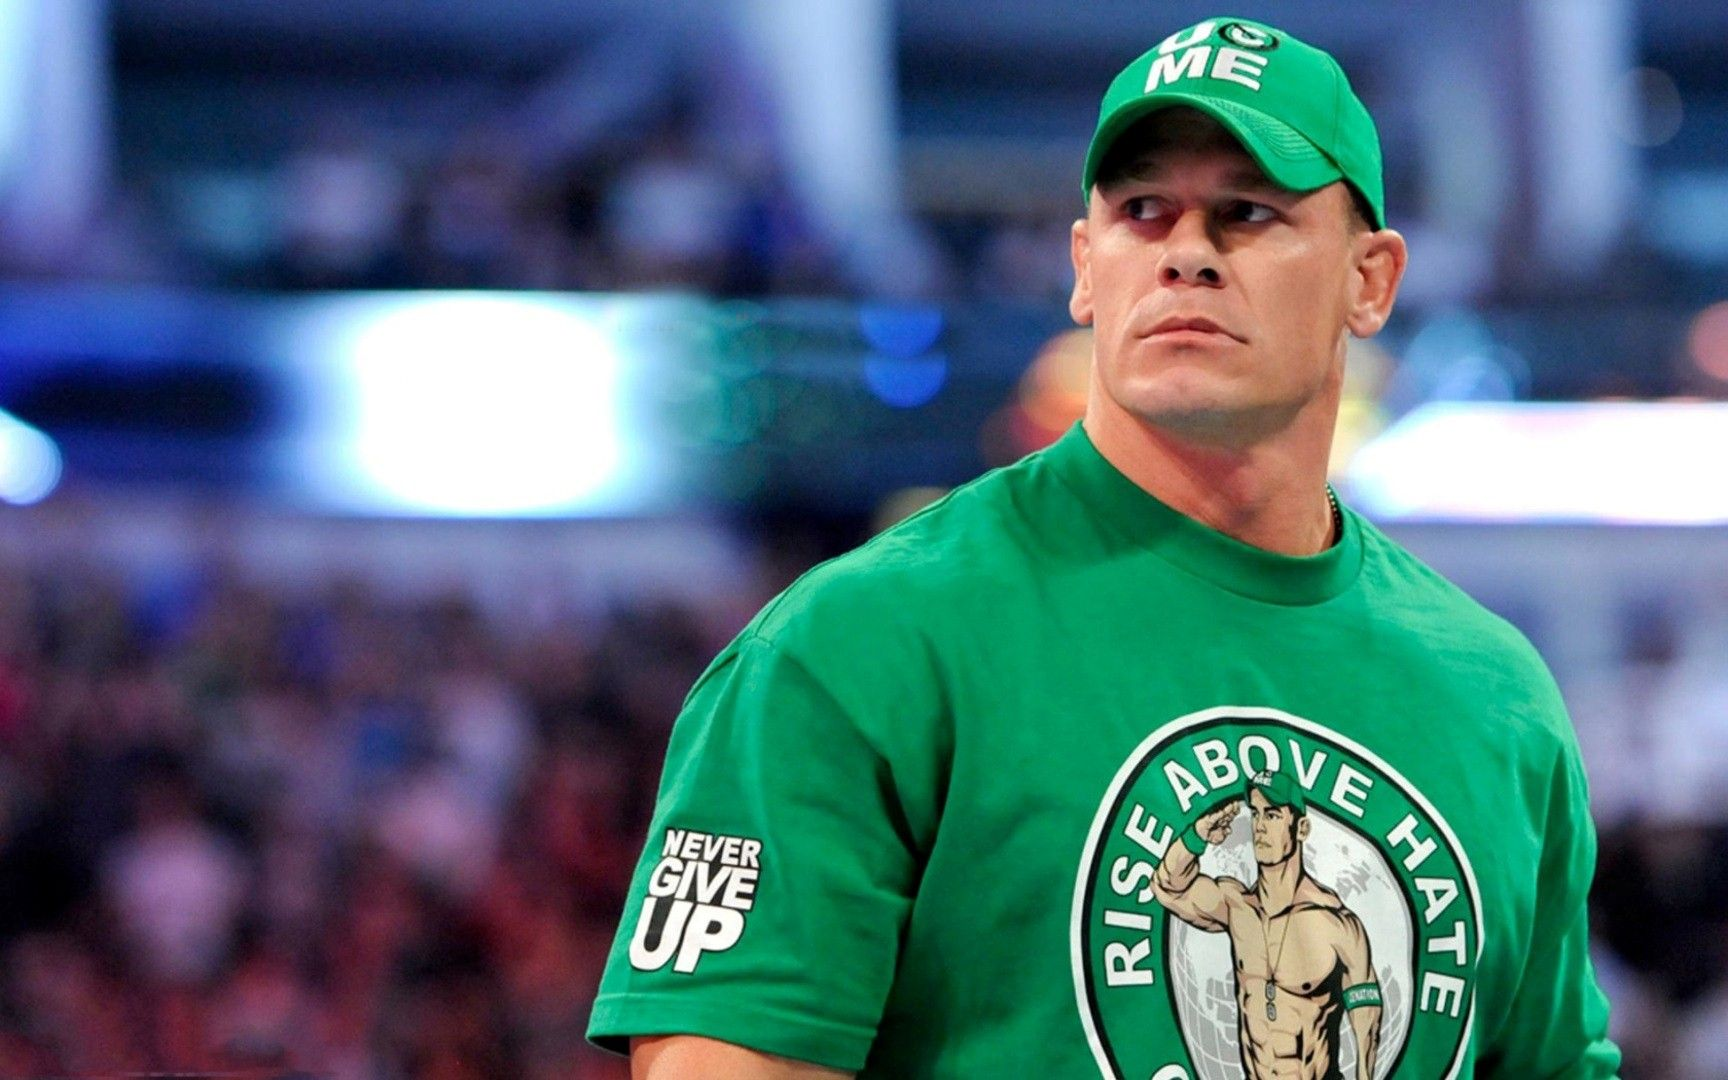 John Cena Wallpapers HD - Free download latest John Cena ...